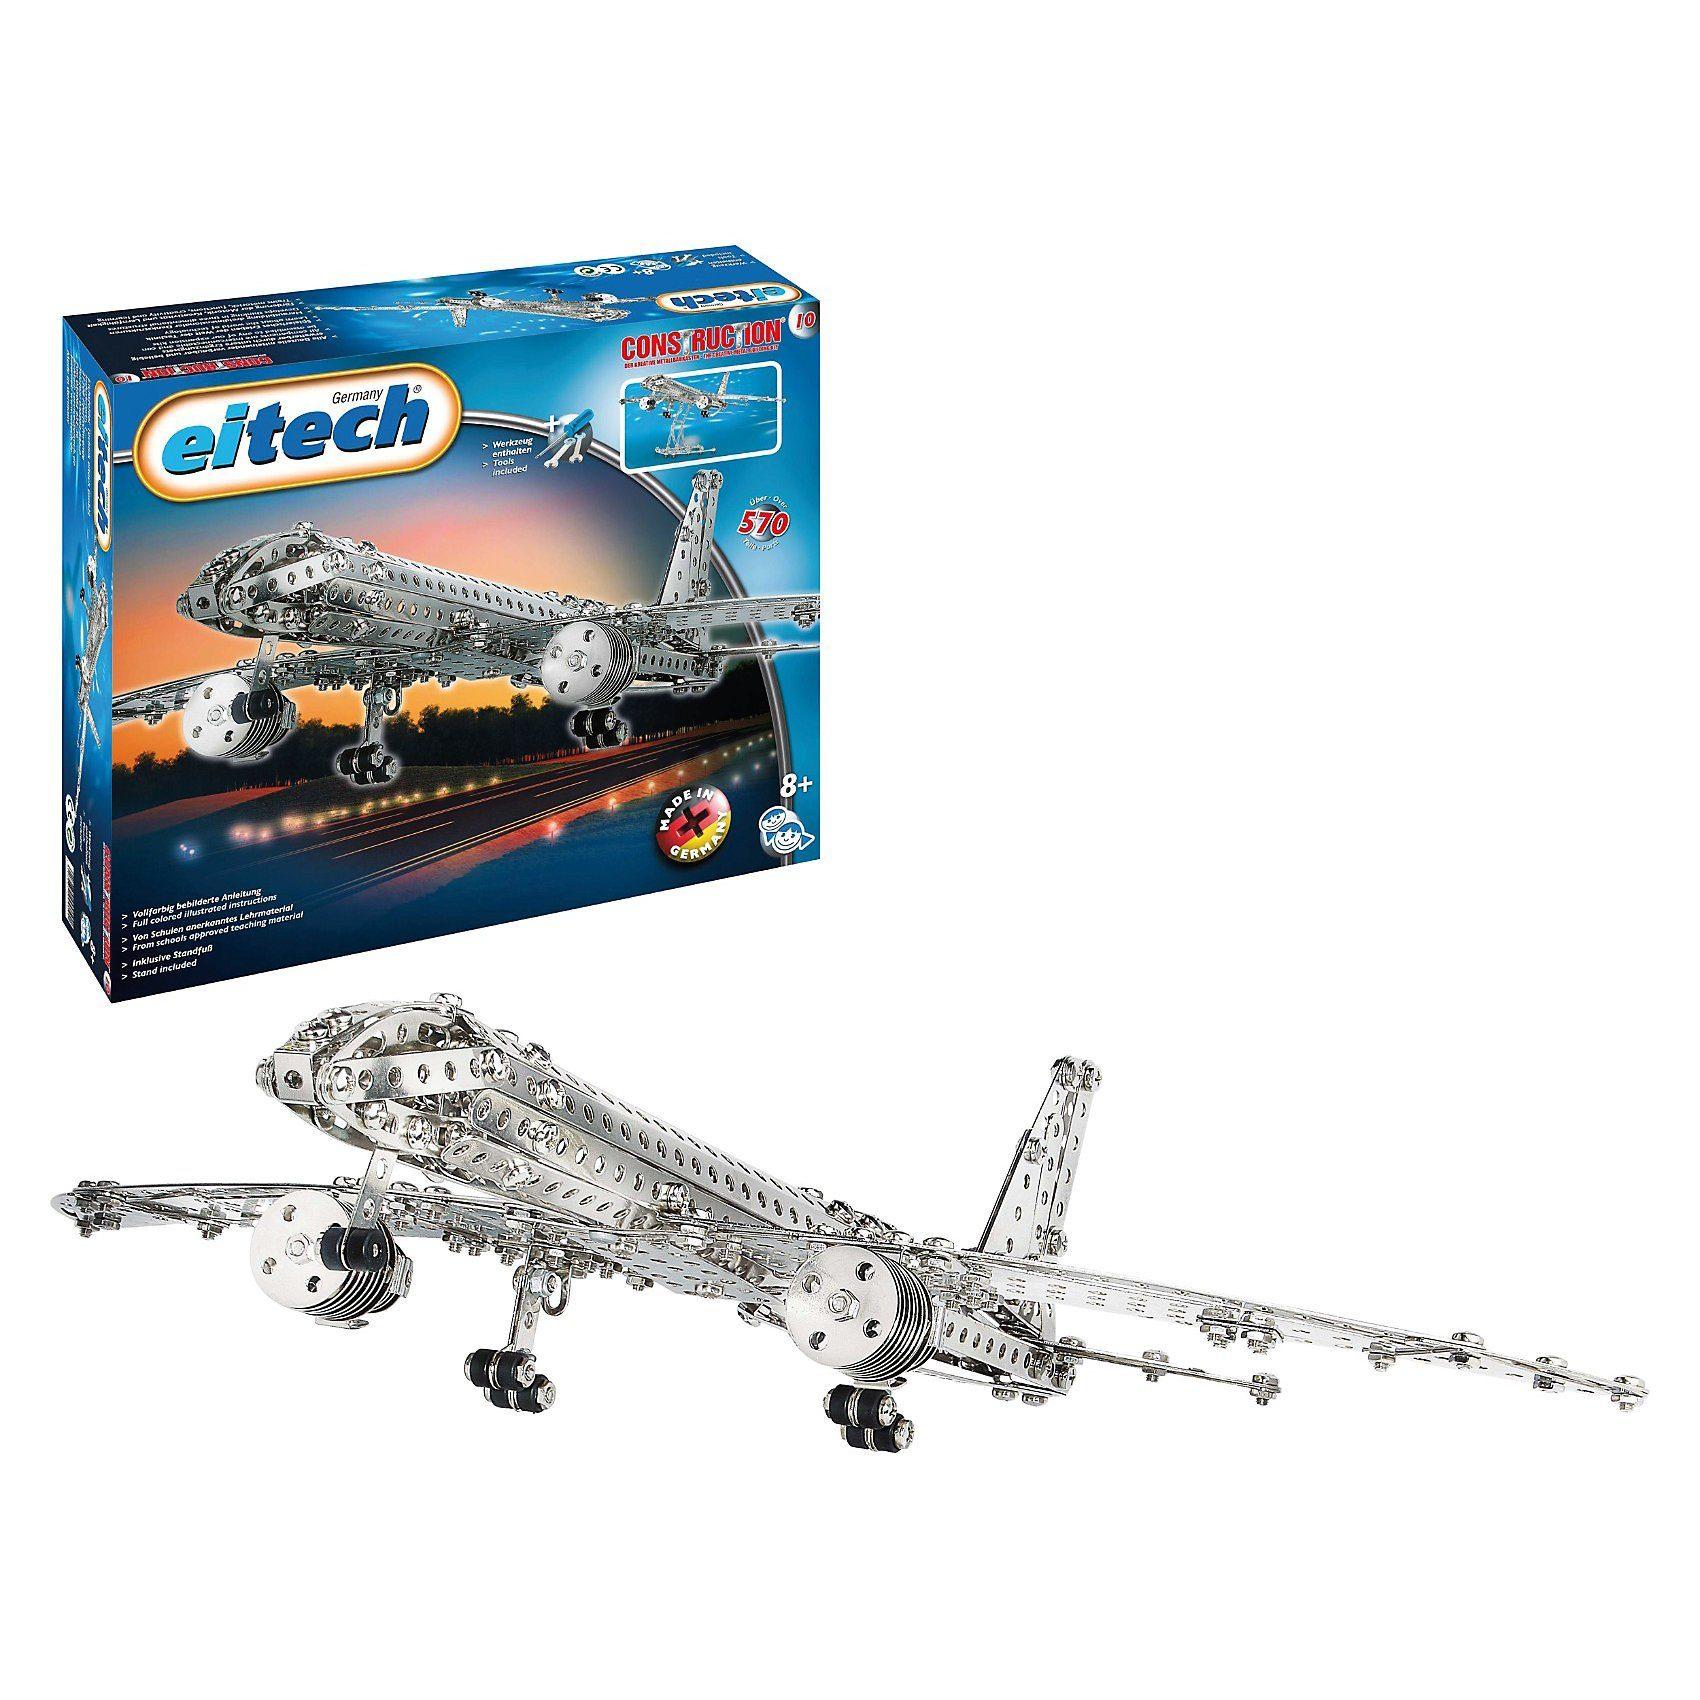 "Eitech C10 KLASSIKER Metallbaukasten - ""Flugzeug"""